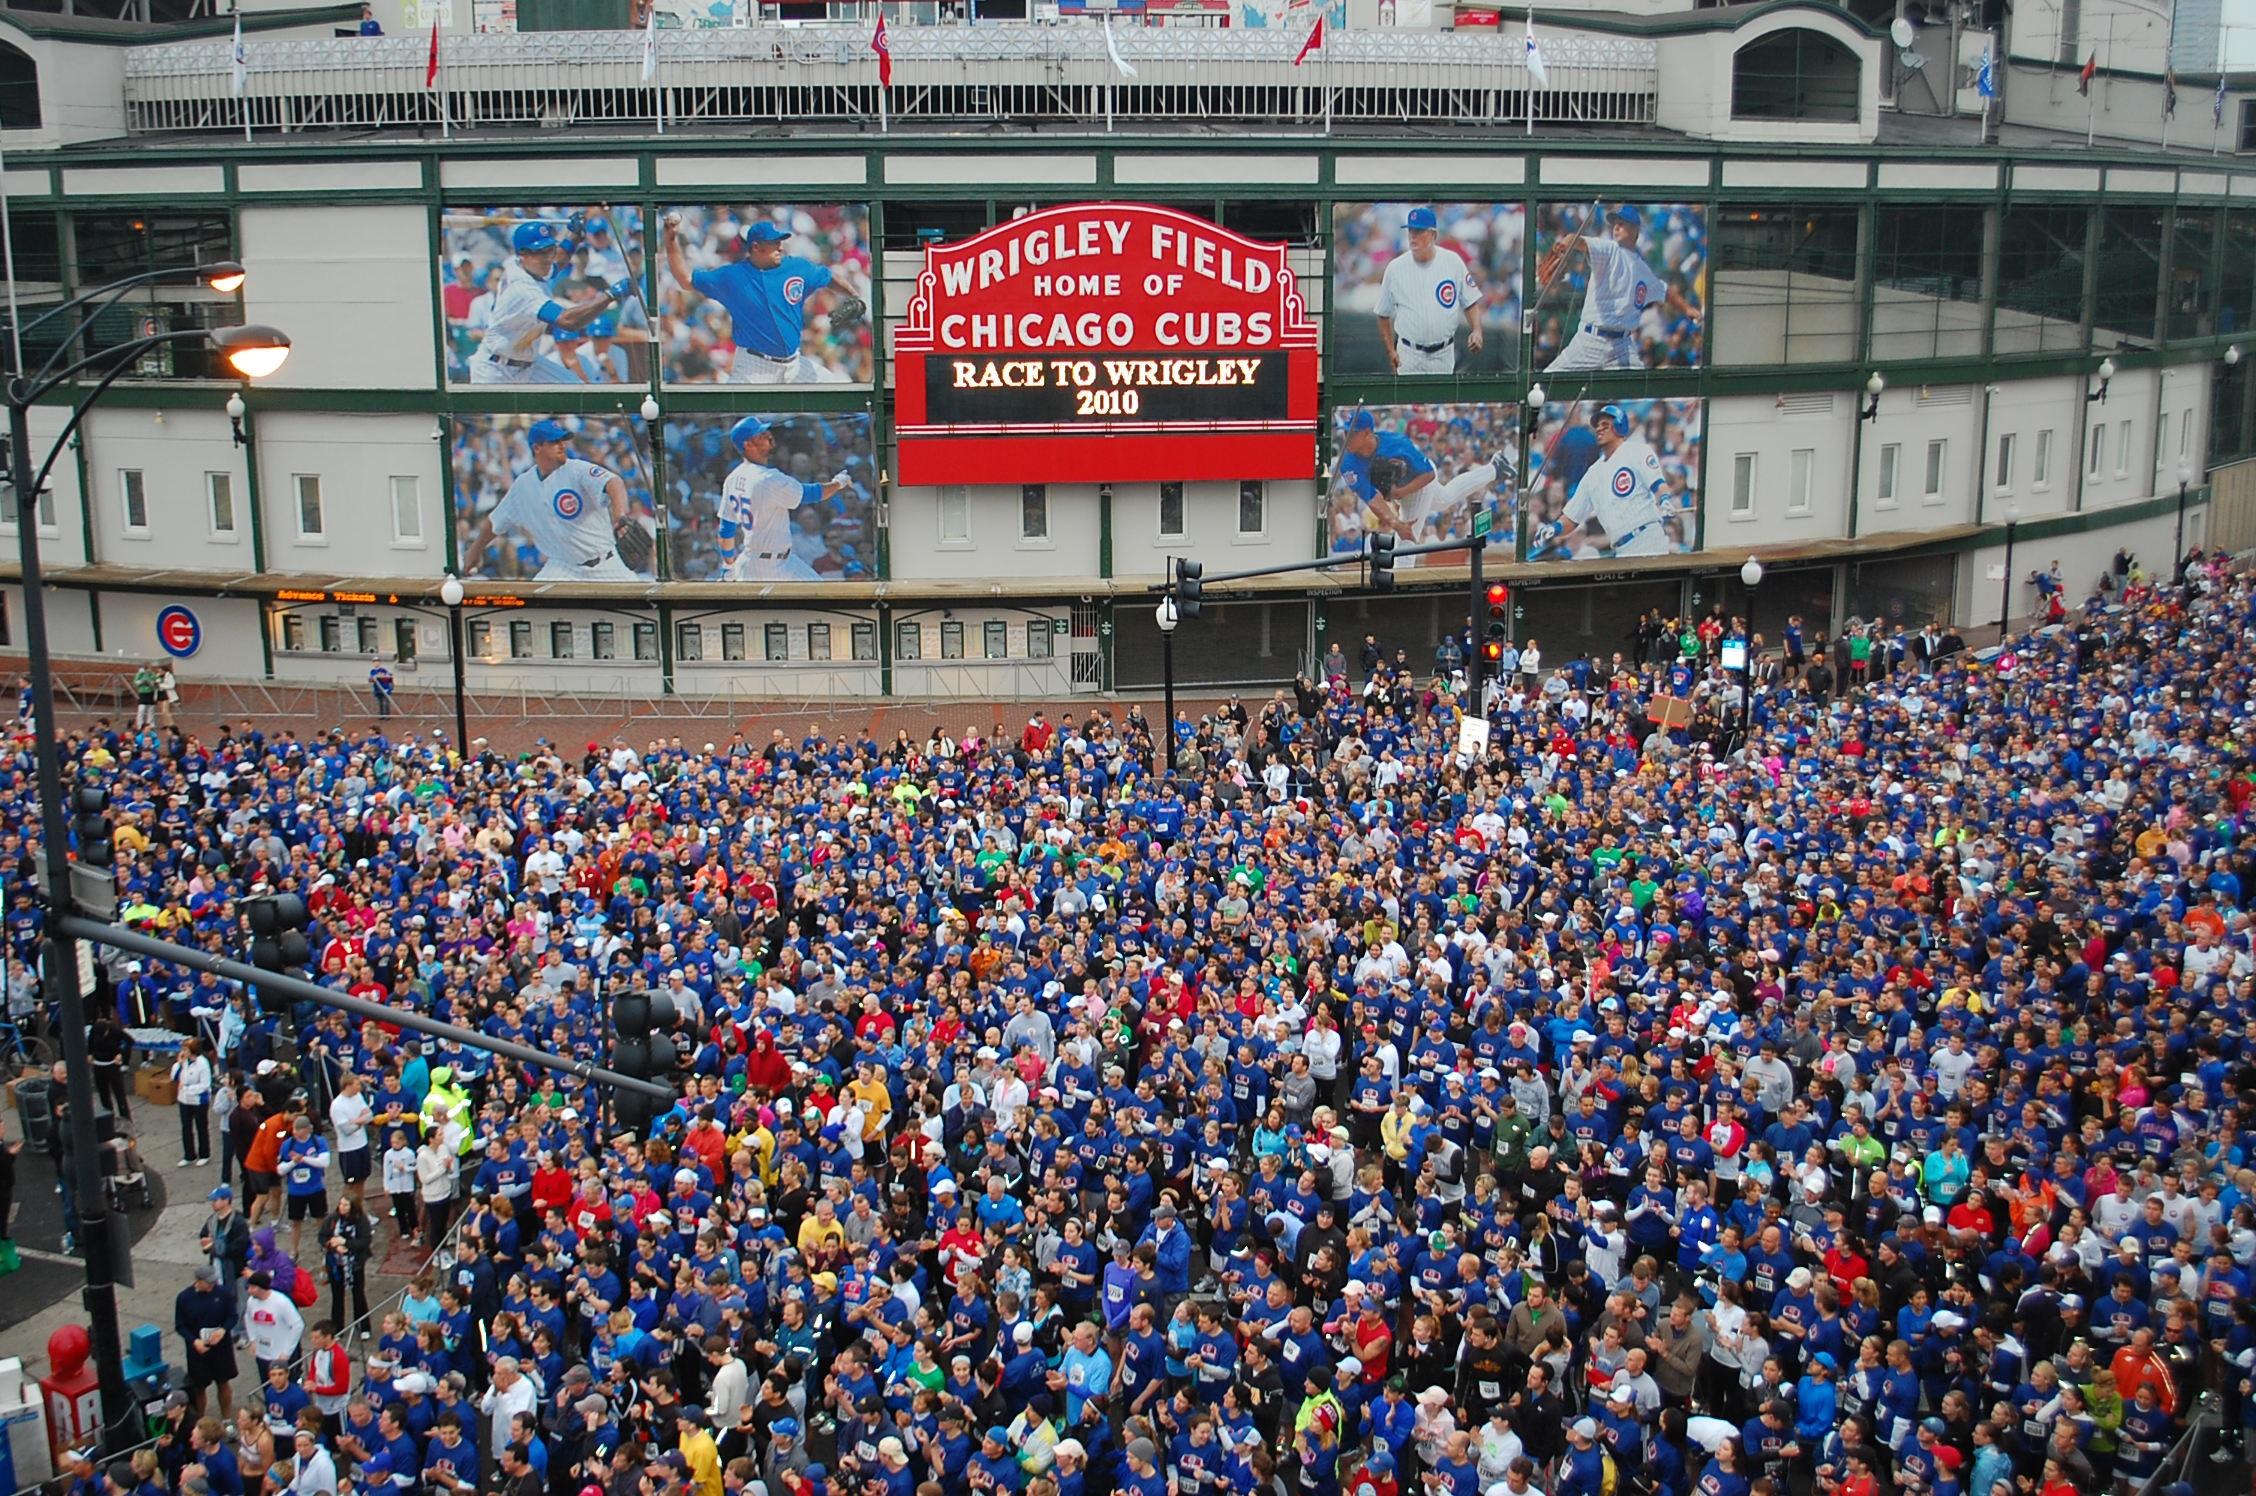 CHICAGO CUBS mlb baseball 40 wallpaper 2256x1496 232554 2256x1496